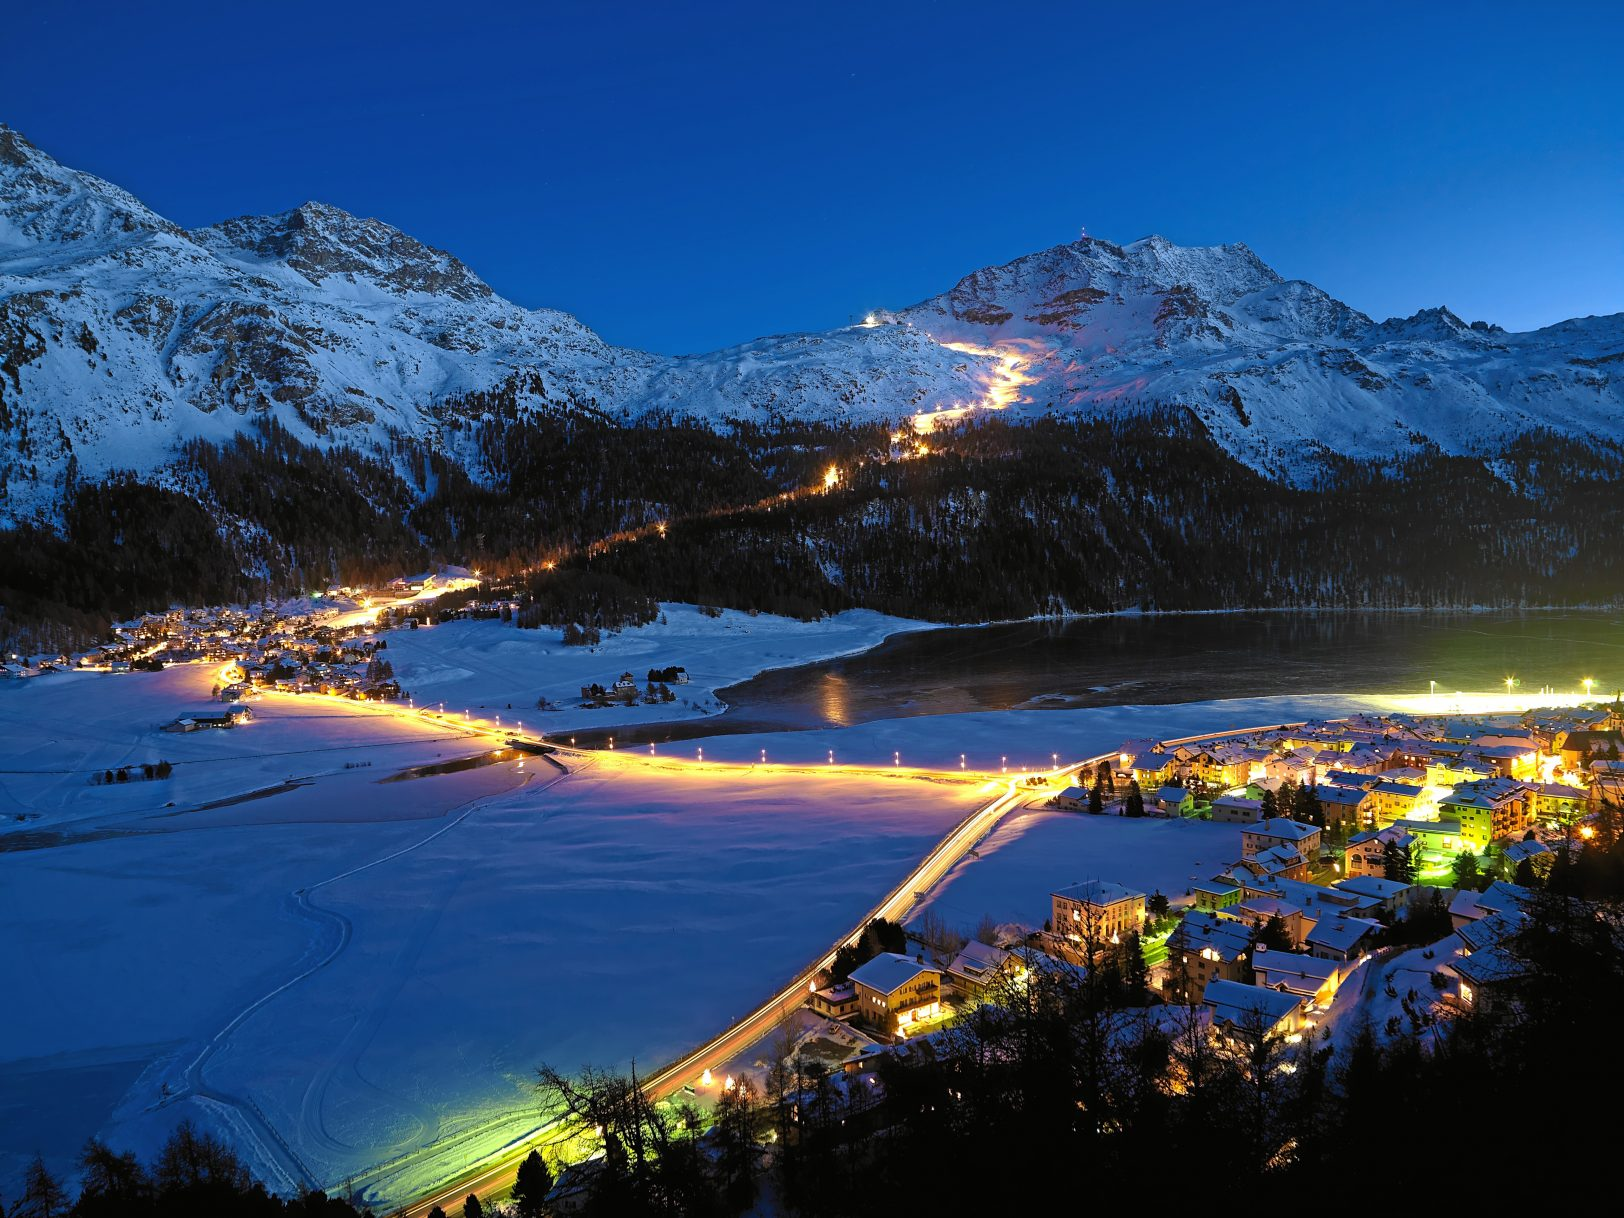 ENGADIN St. Moritz: Beleuchtete Skipiste